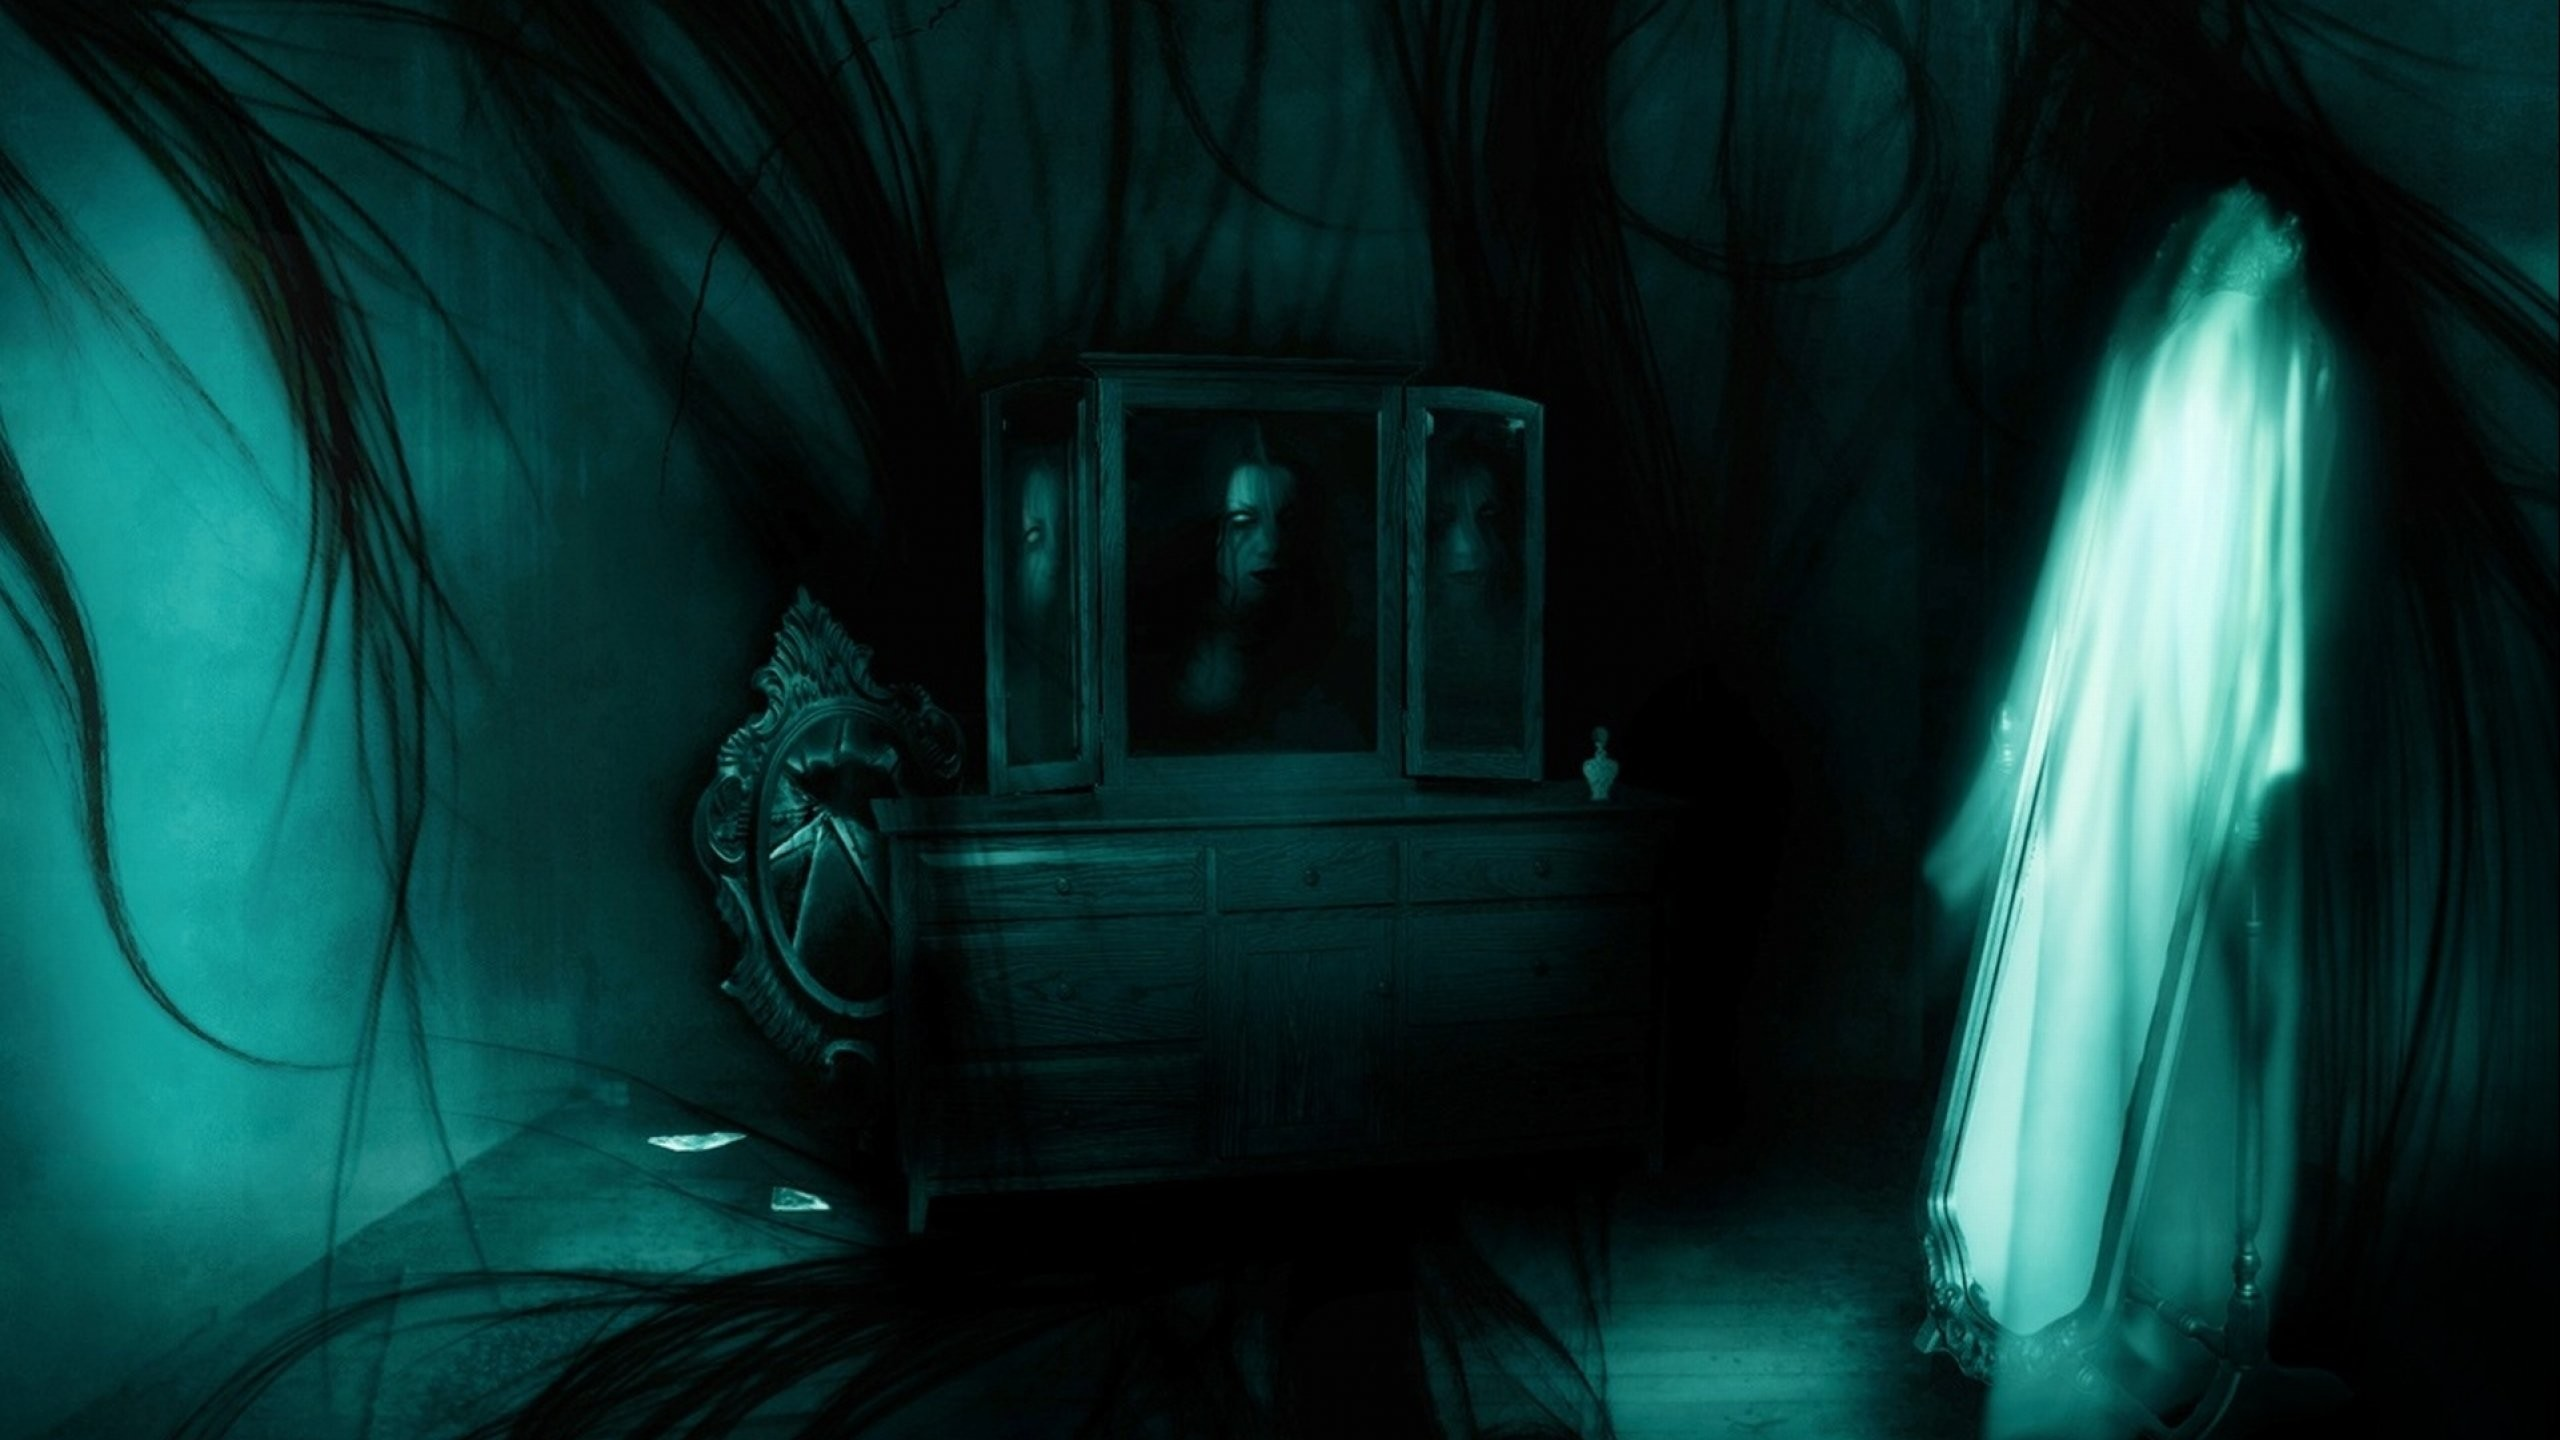 dark-ghost-fantasy-art-artwork-horror-spooky-creepy-halloween-gothic- wallpaper-1.jpg (2560×1440) | cool stuff | Pinterest | Creepy ghost, 3d  wallpaper and …